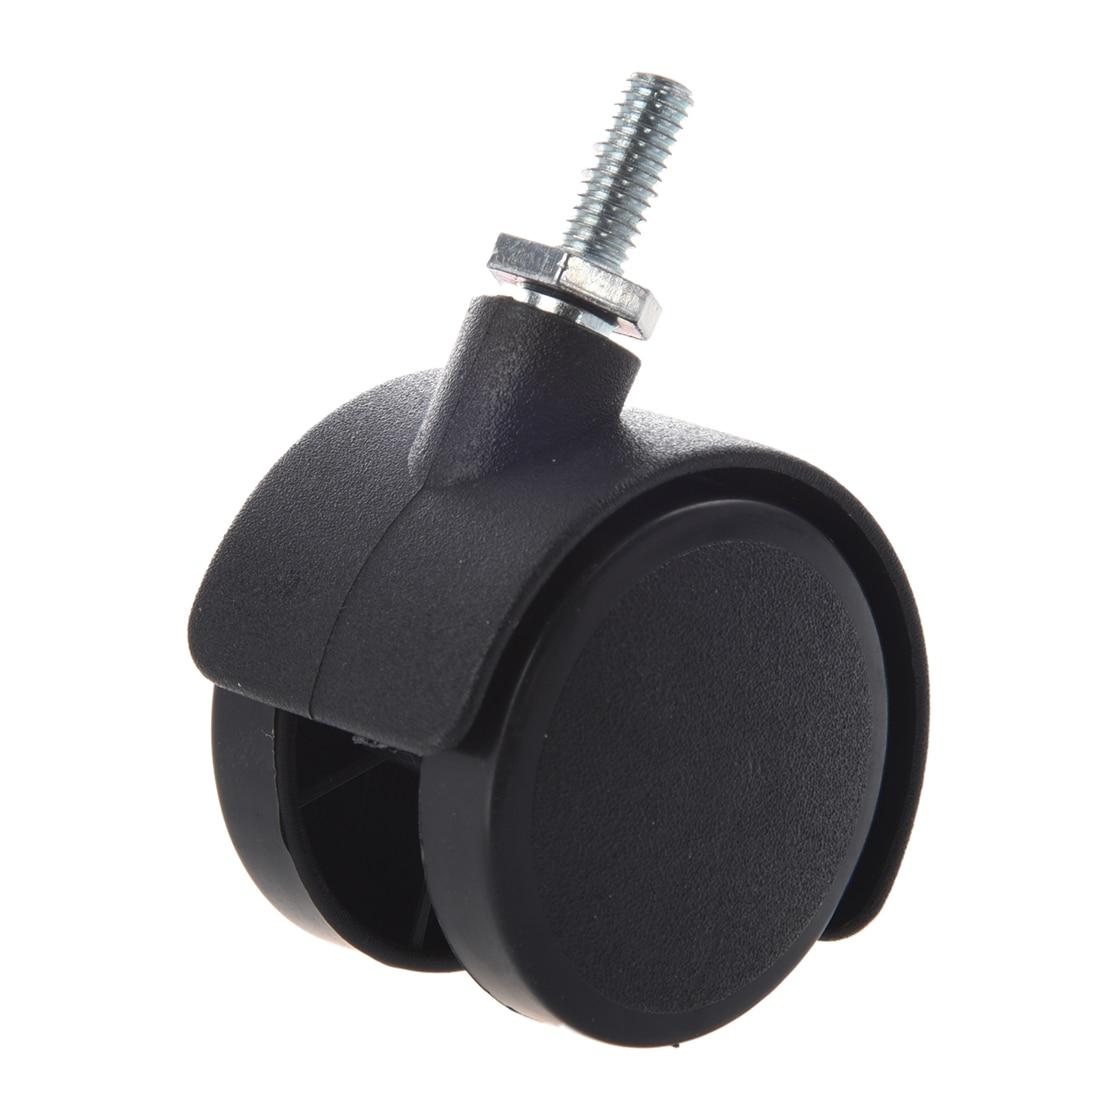 Rodízio giratório da roda dupla da haste 40mm rosqueada de 6mm preto-0